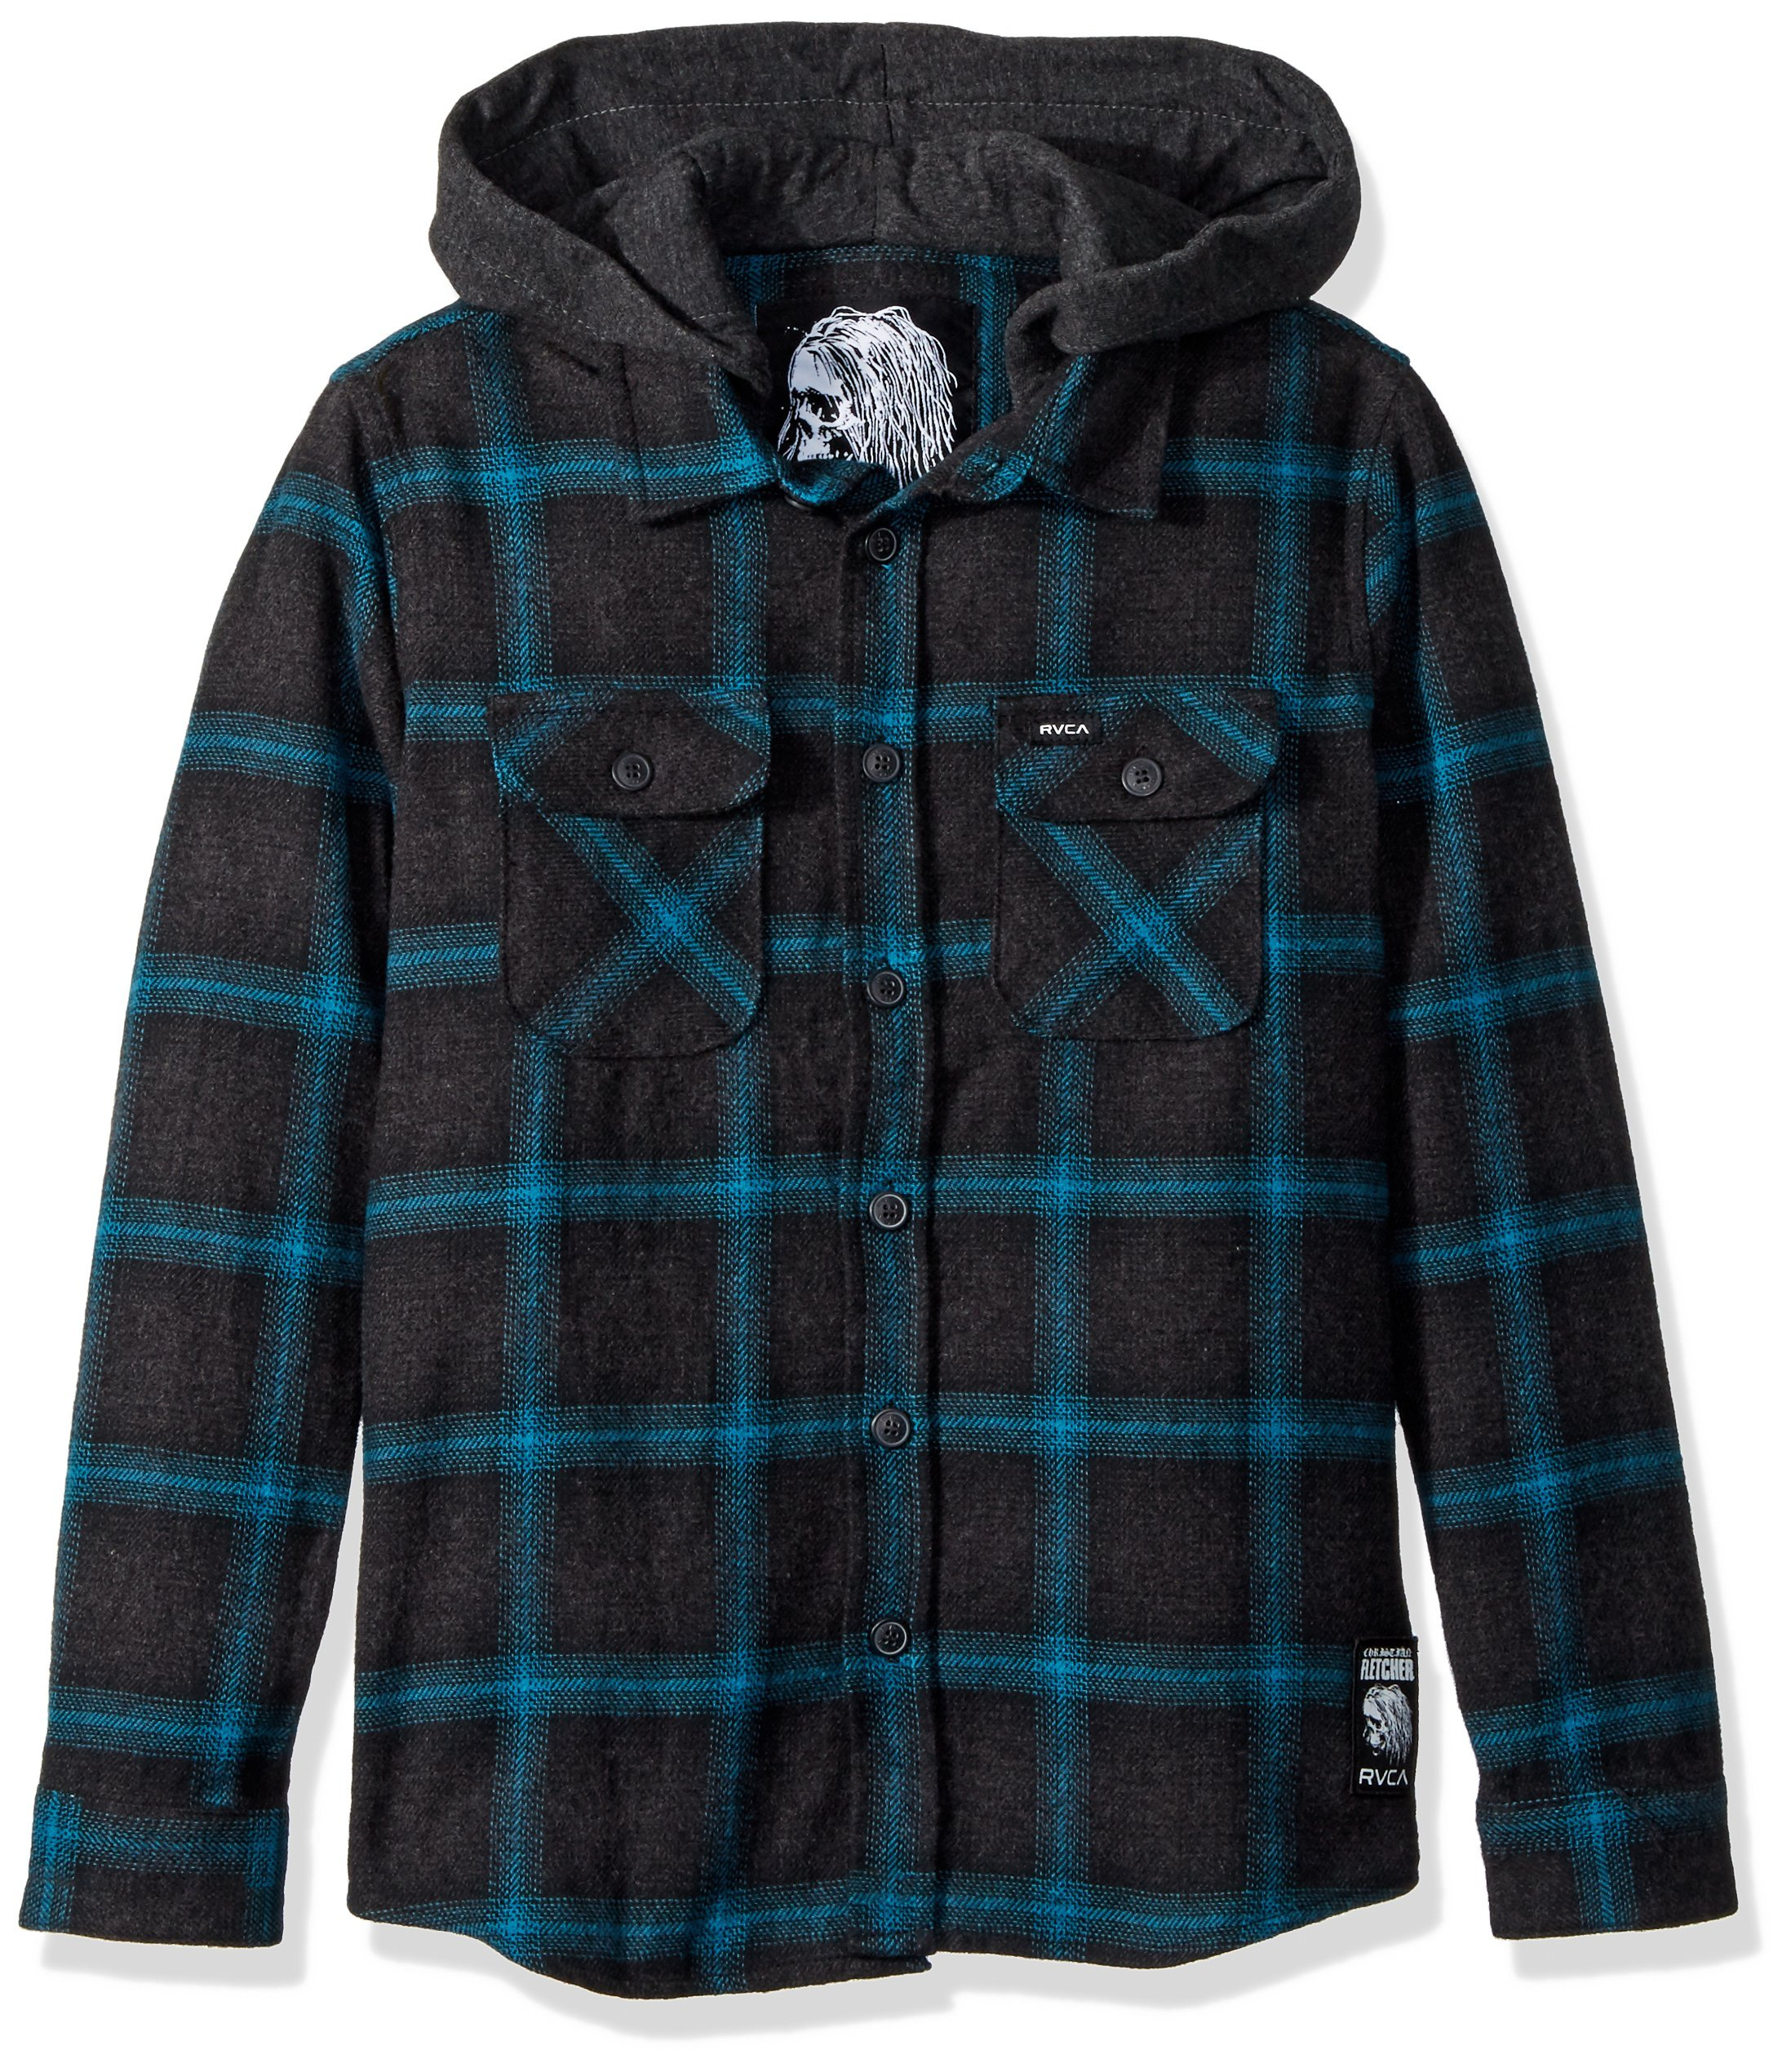 RVCA Boys' Big Good Hombre Long Sleeve Hooded Flannel Shirt, Charcoal Heather L